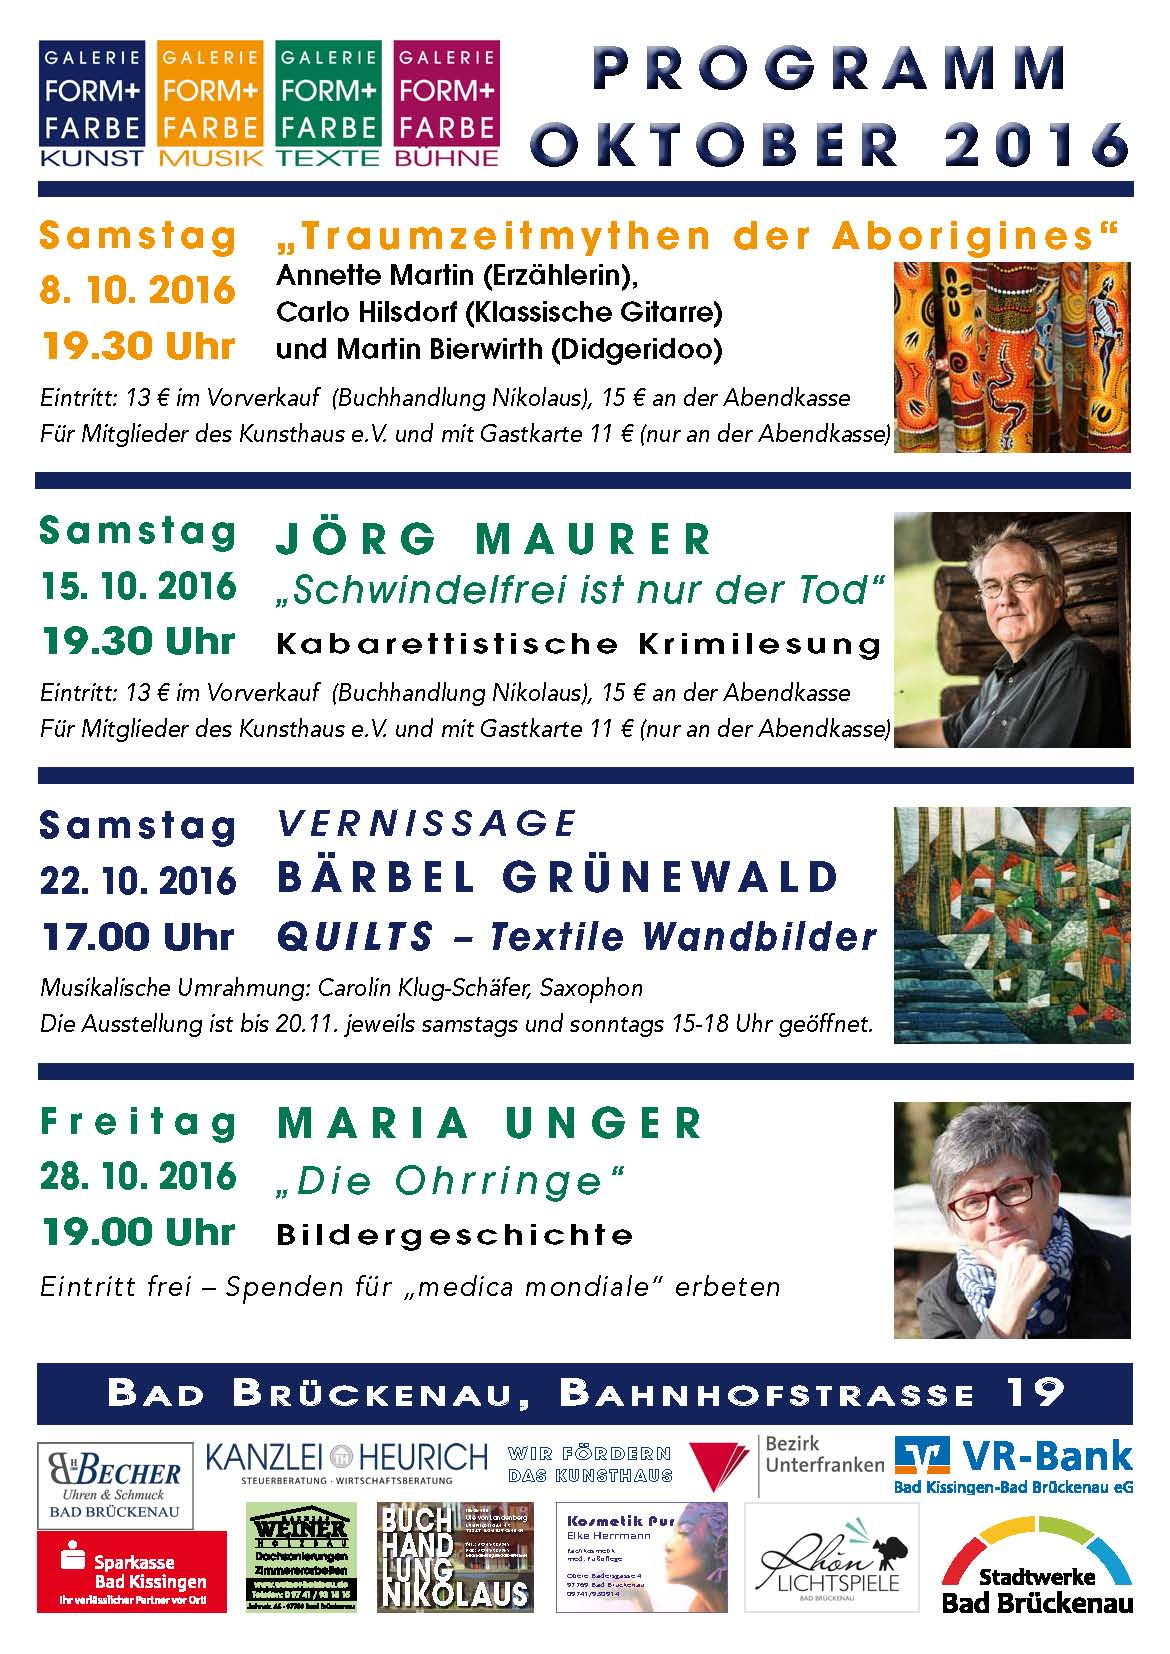 programm-oktober-2016